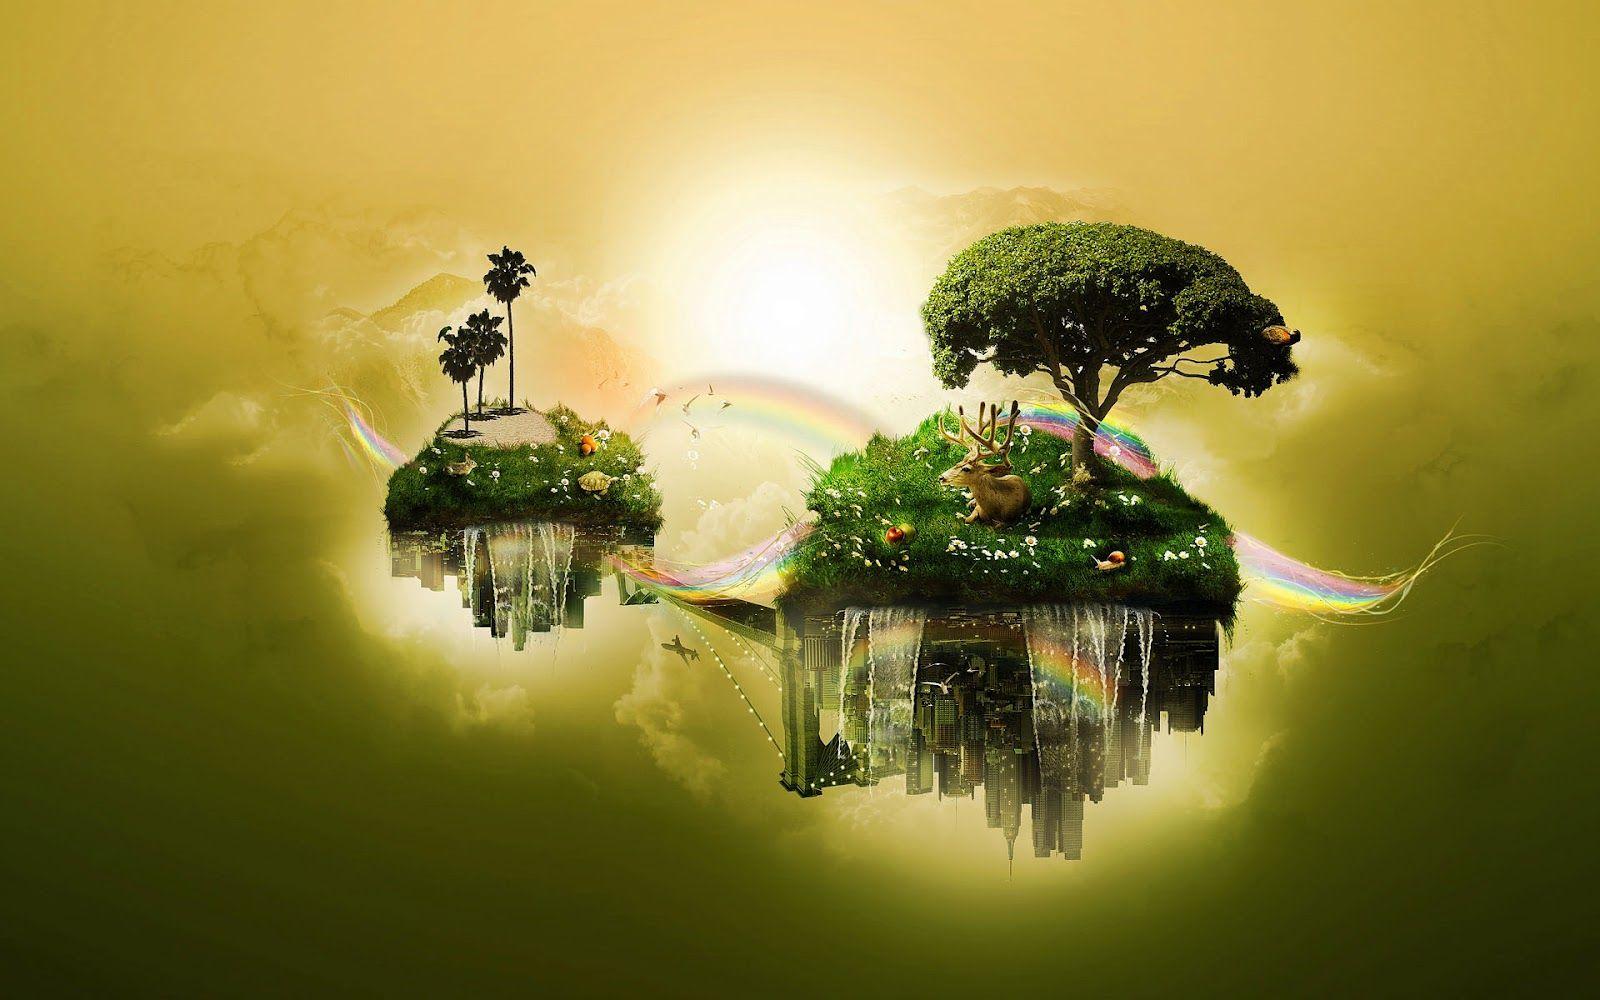 Magical world island hd wallpapersg 16001000 art of magical world island hd wallpapersg 16001000 voltagebd Choice Image